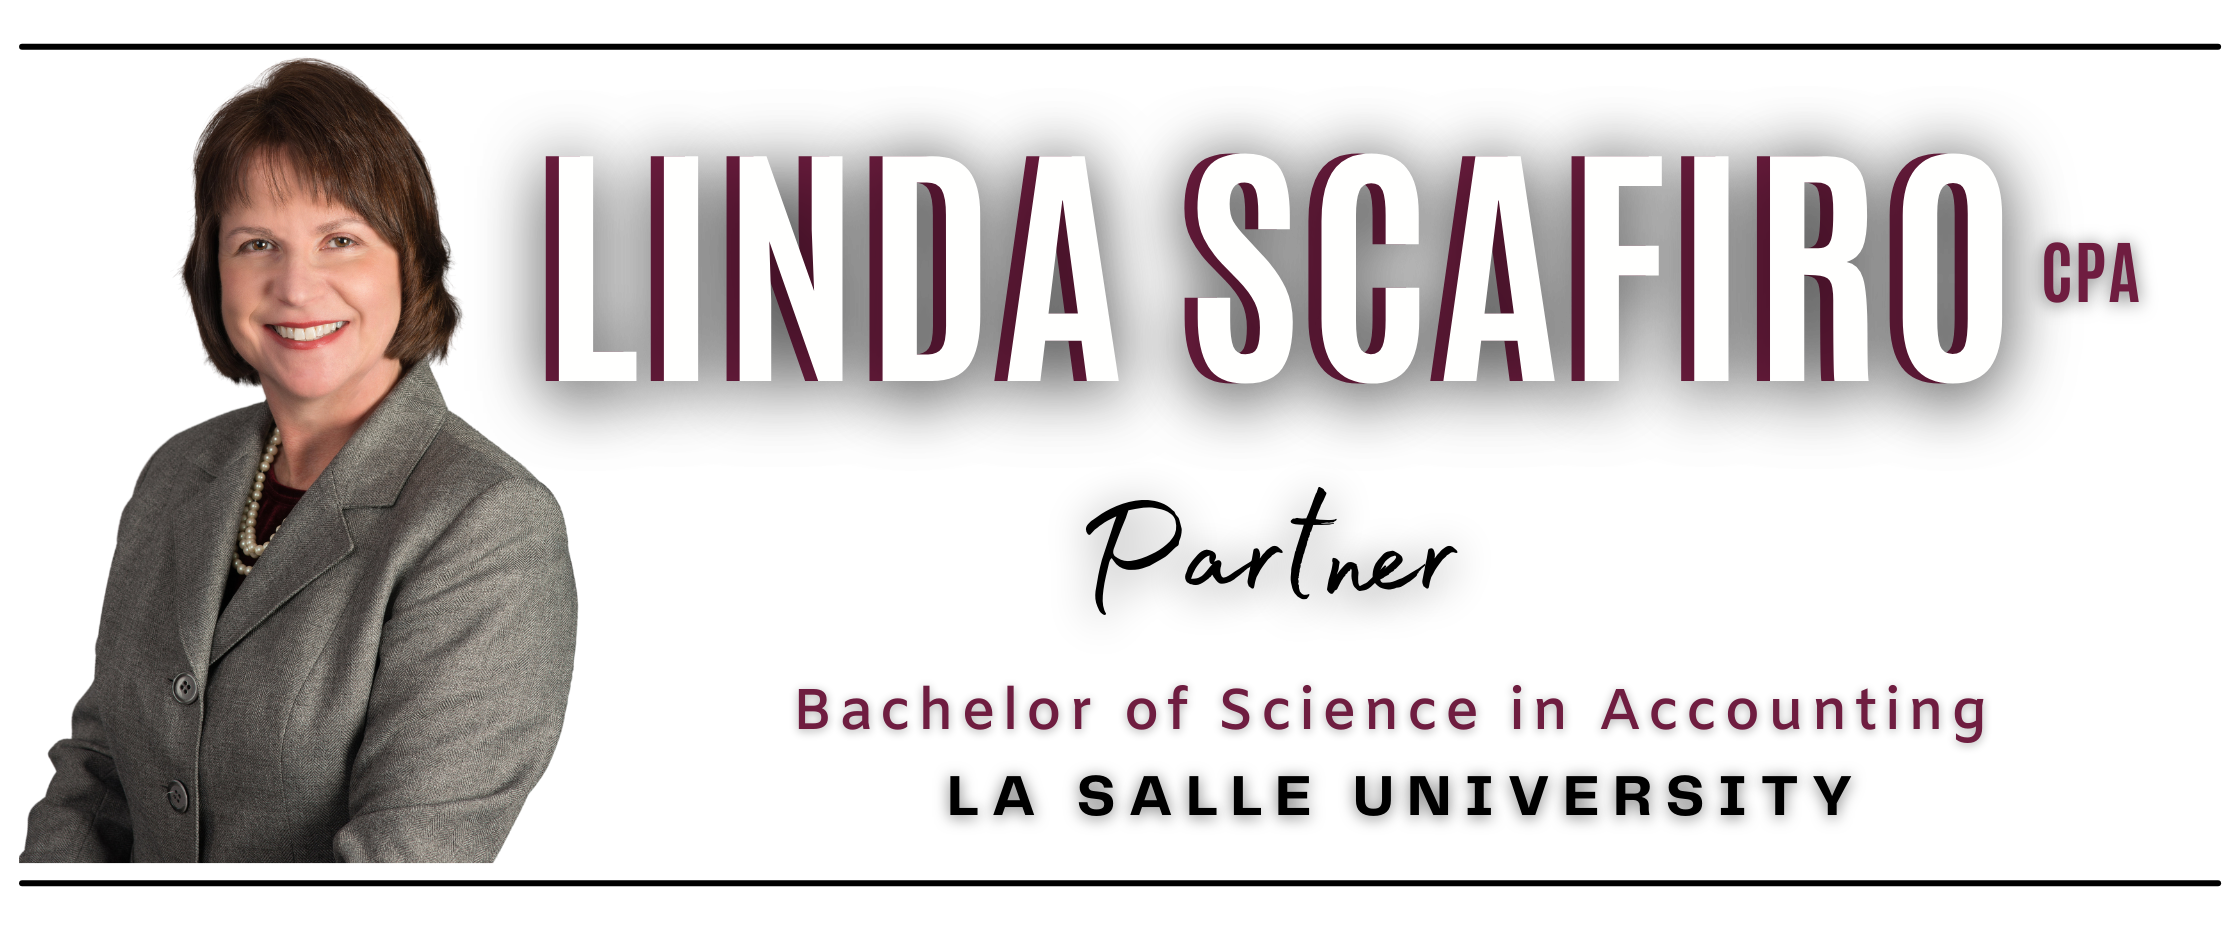 LindaScafiro-1